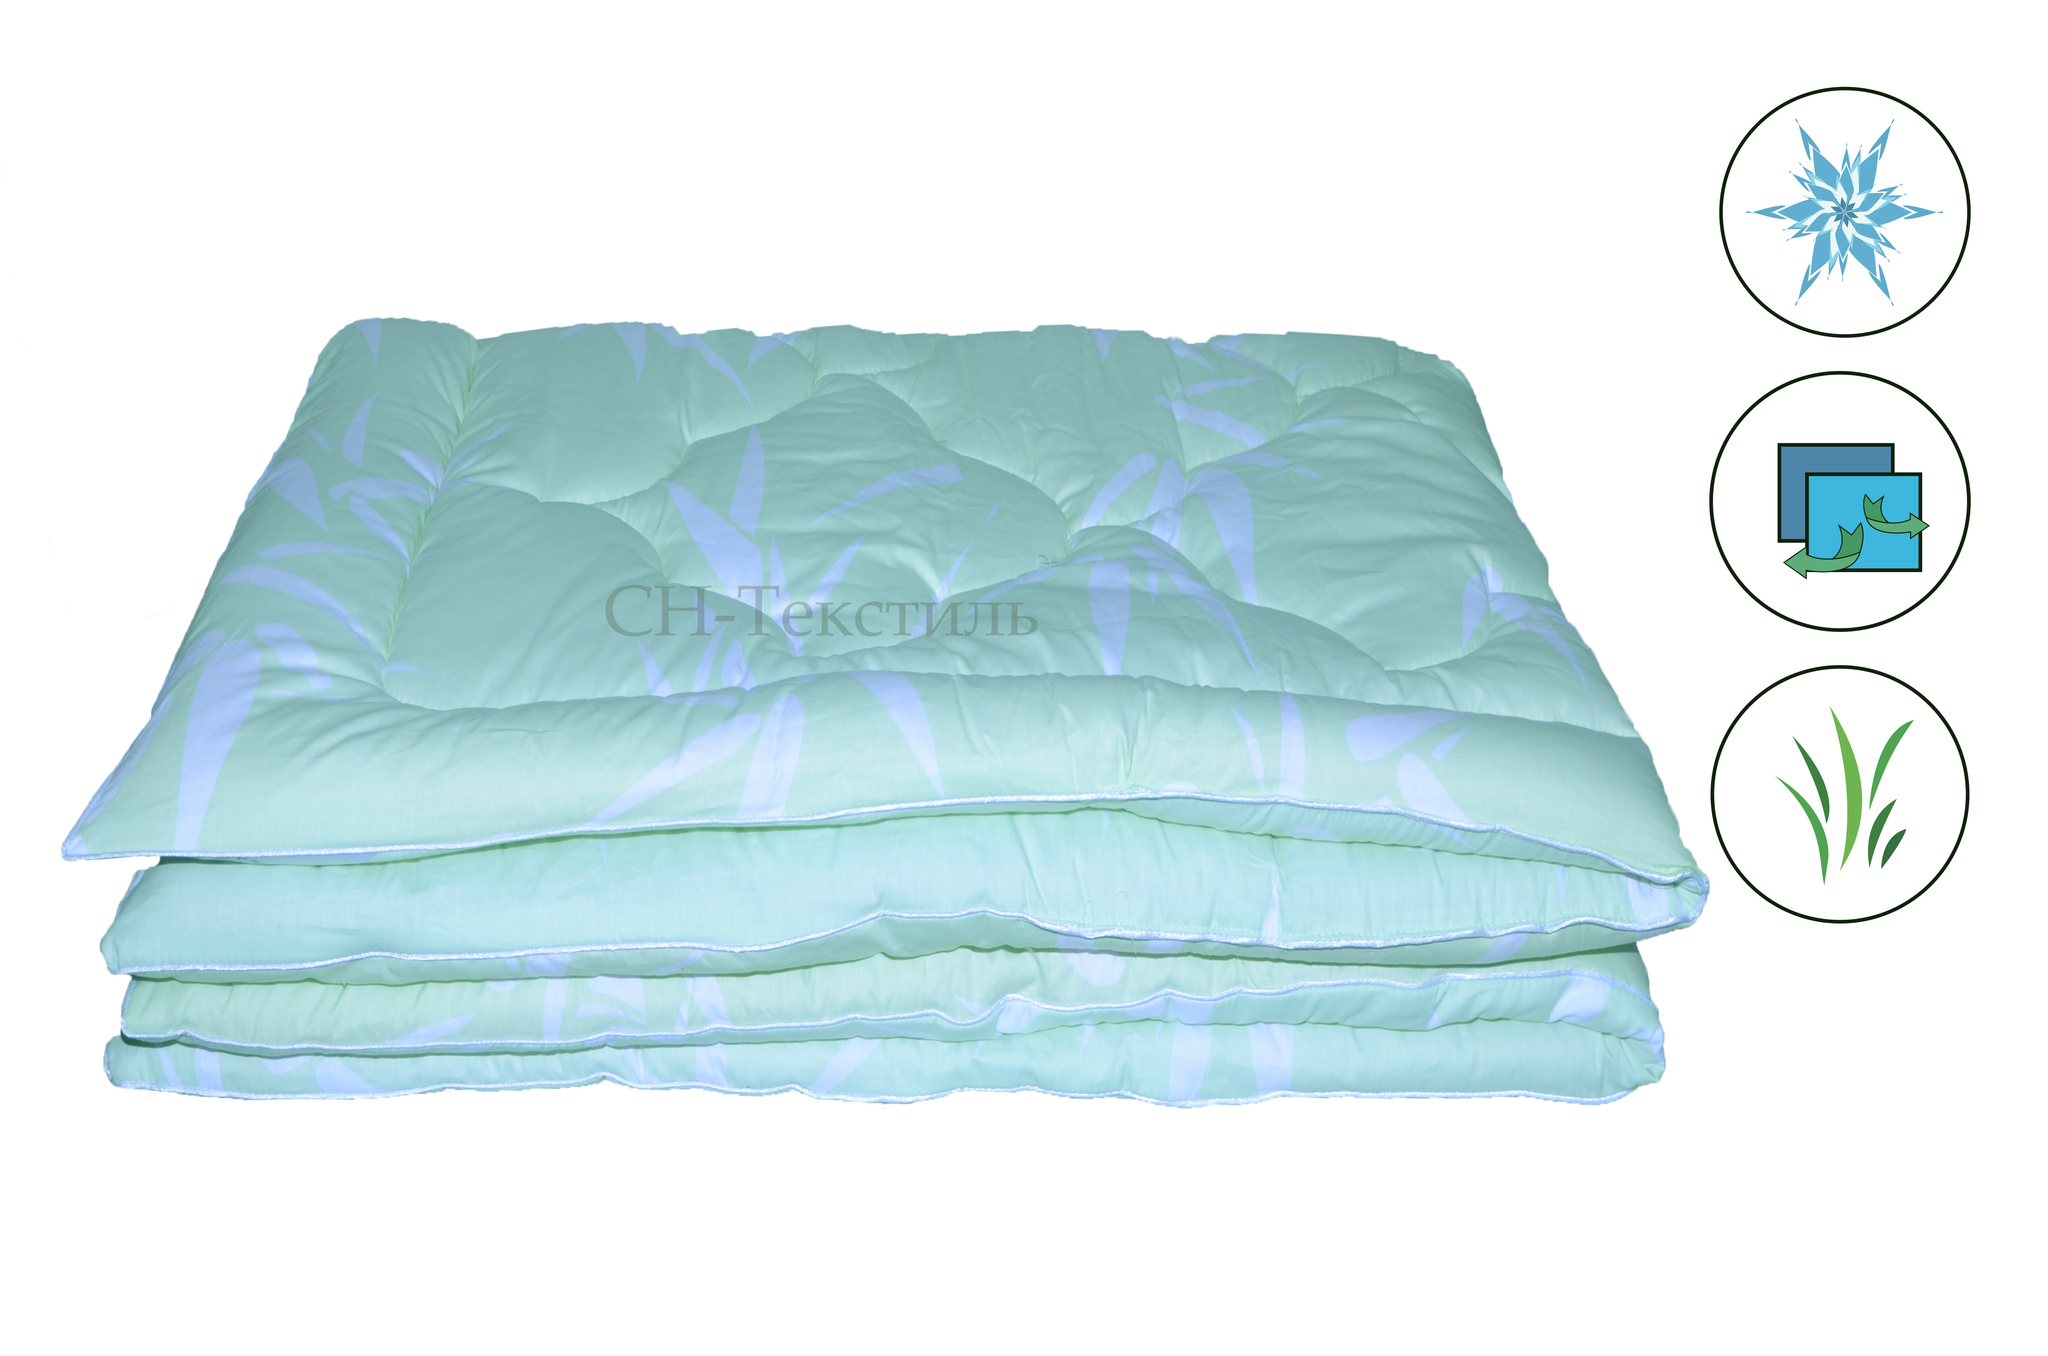 Одеяла Одеяло бамбуковое в сатине Теплое. бамбук_одеяло_зимнее.jpg